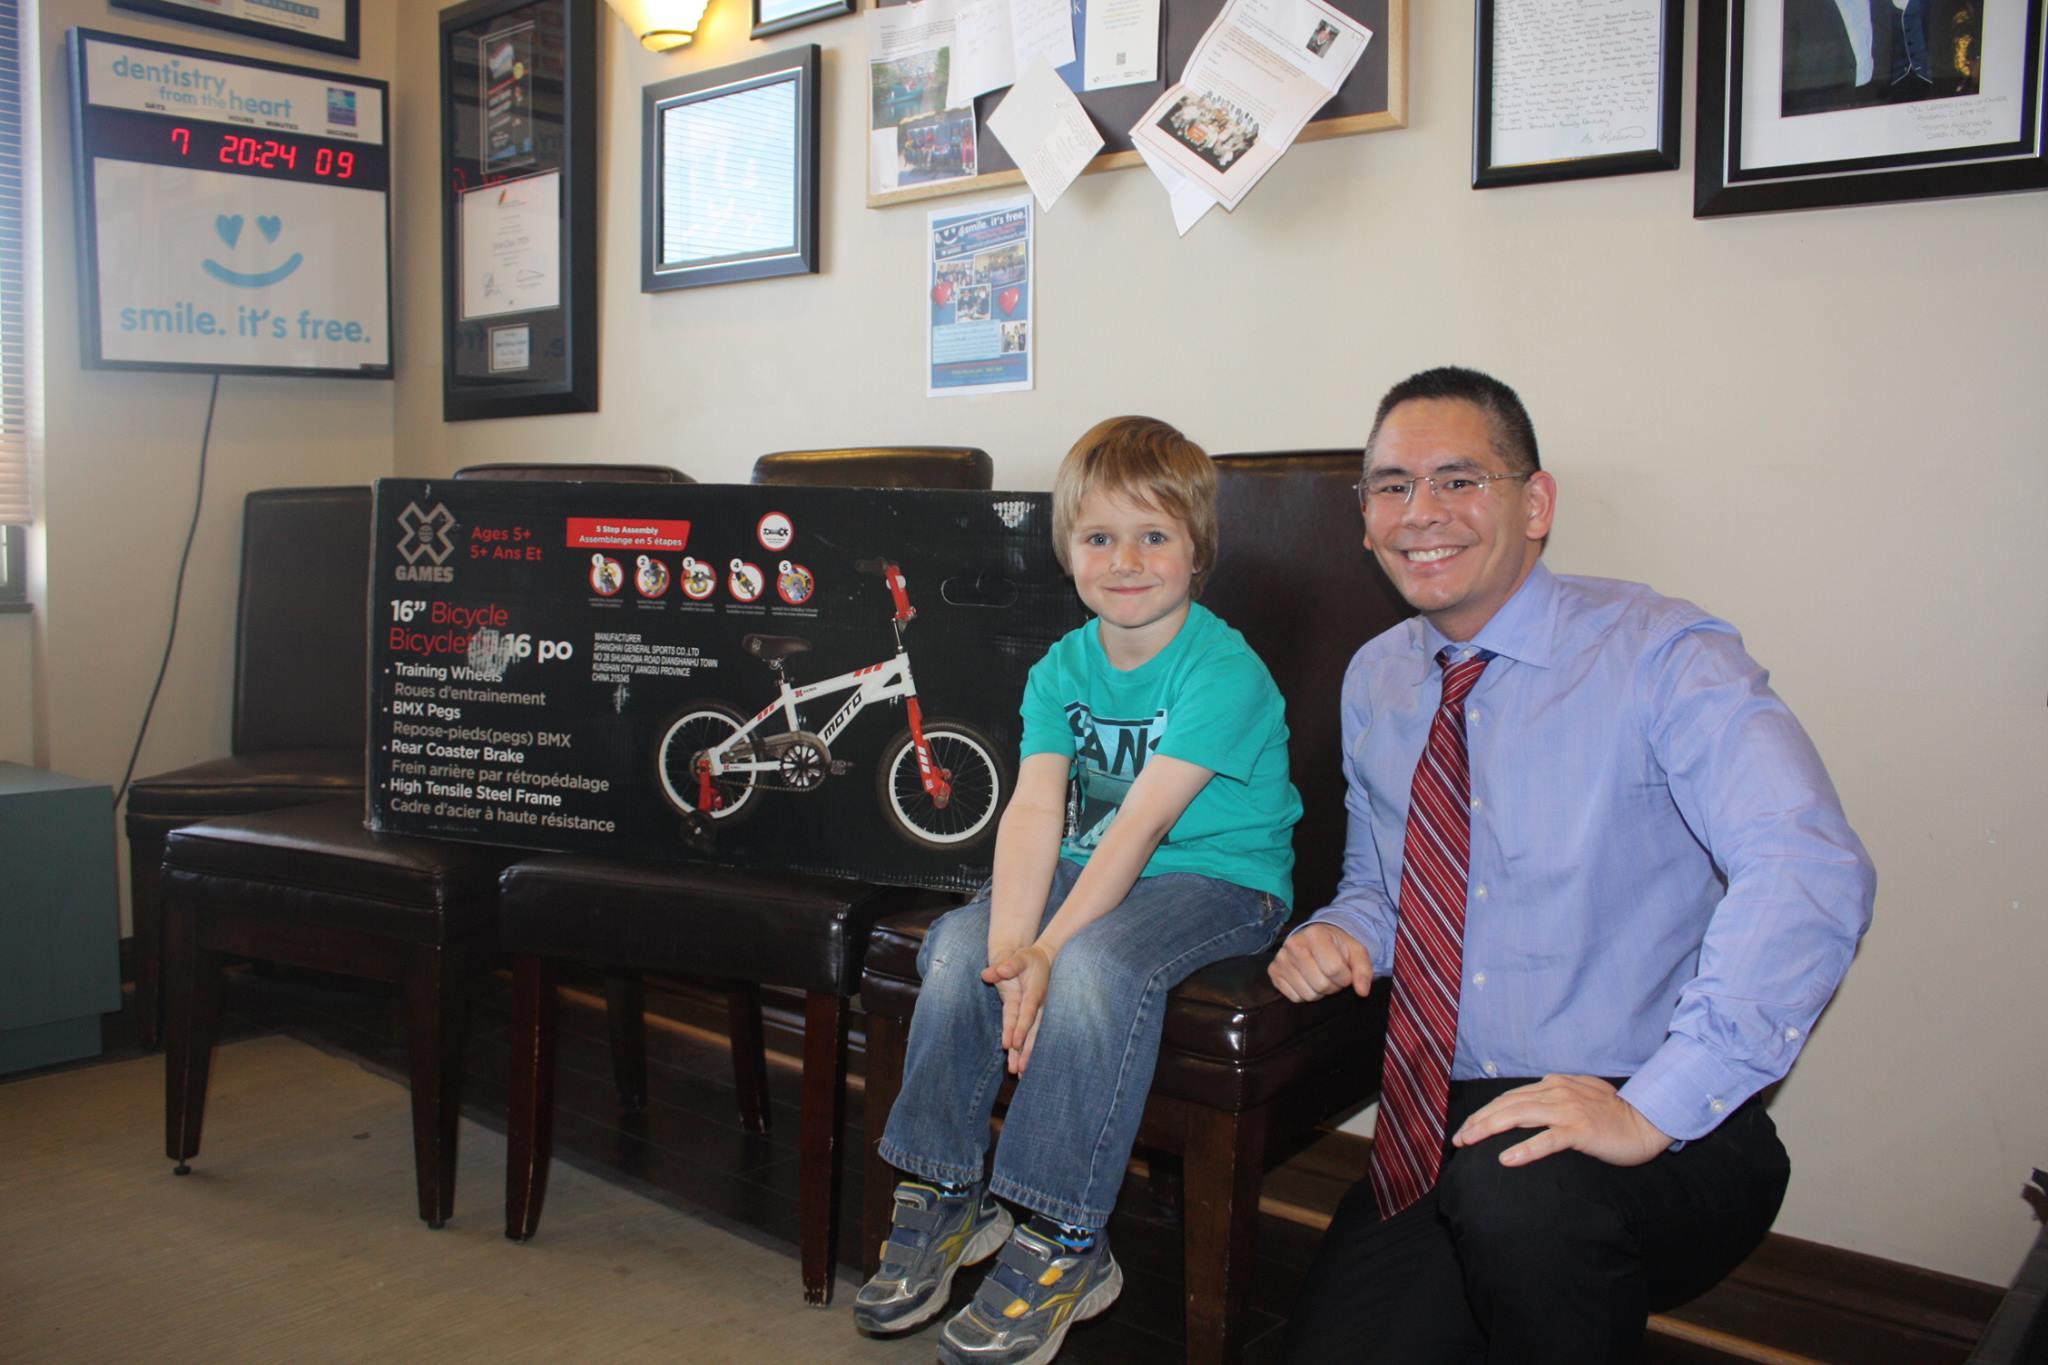 Bradford Family Dentistry Boy's Bike Giveaway